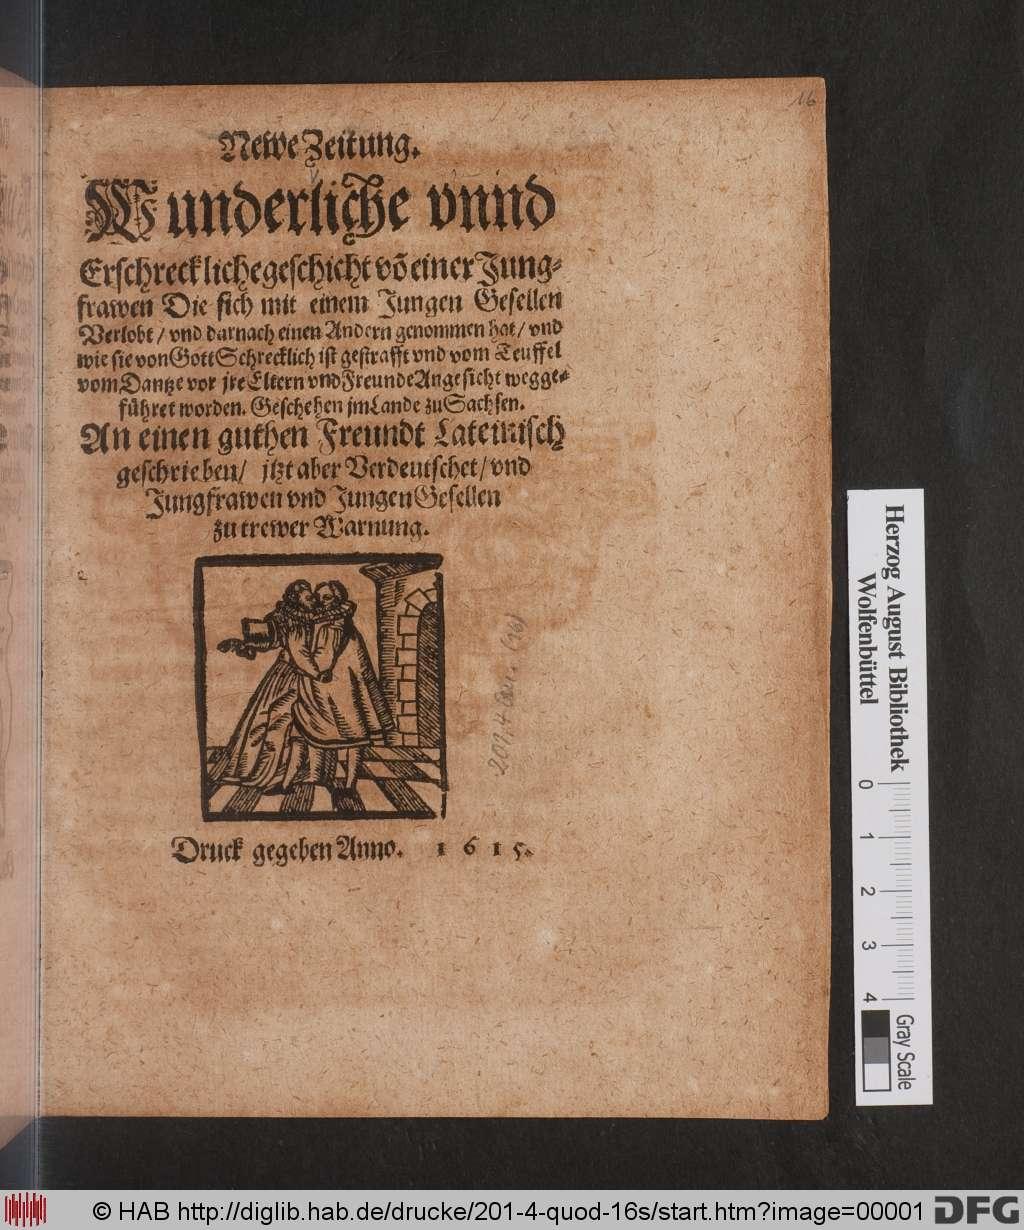 http://diglib.hab.de/drucke/201-4-quod-16s/00001.jpg